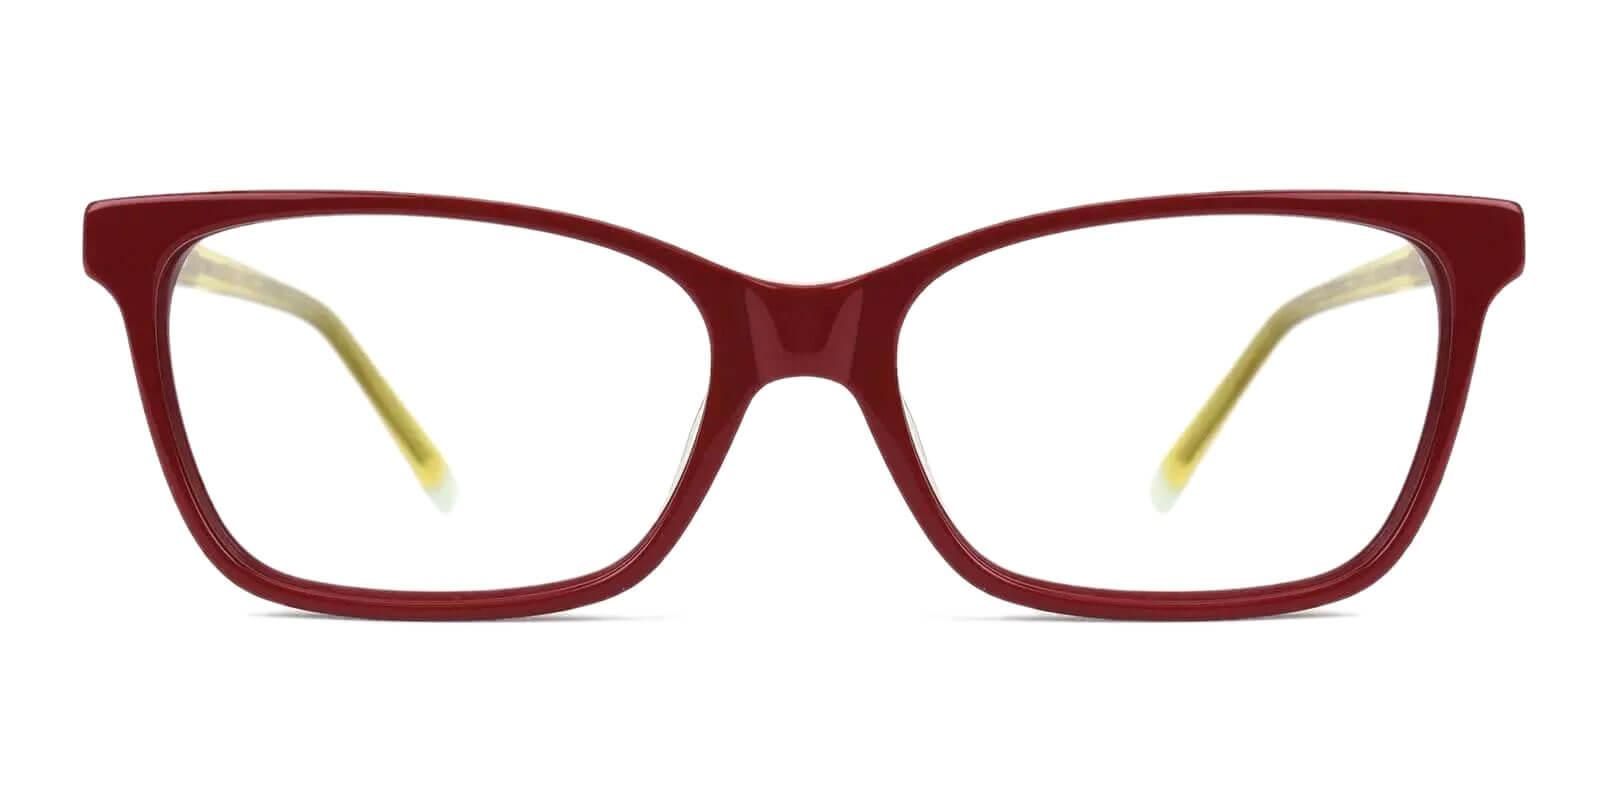 RingGold Yellow Acetate Eyeglasses , SpringHinges , UniversalBridgeFit Frames from ABBE Glasses